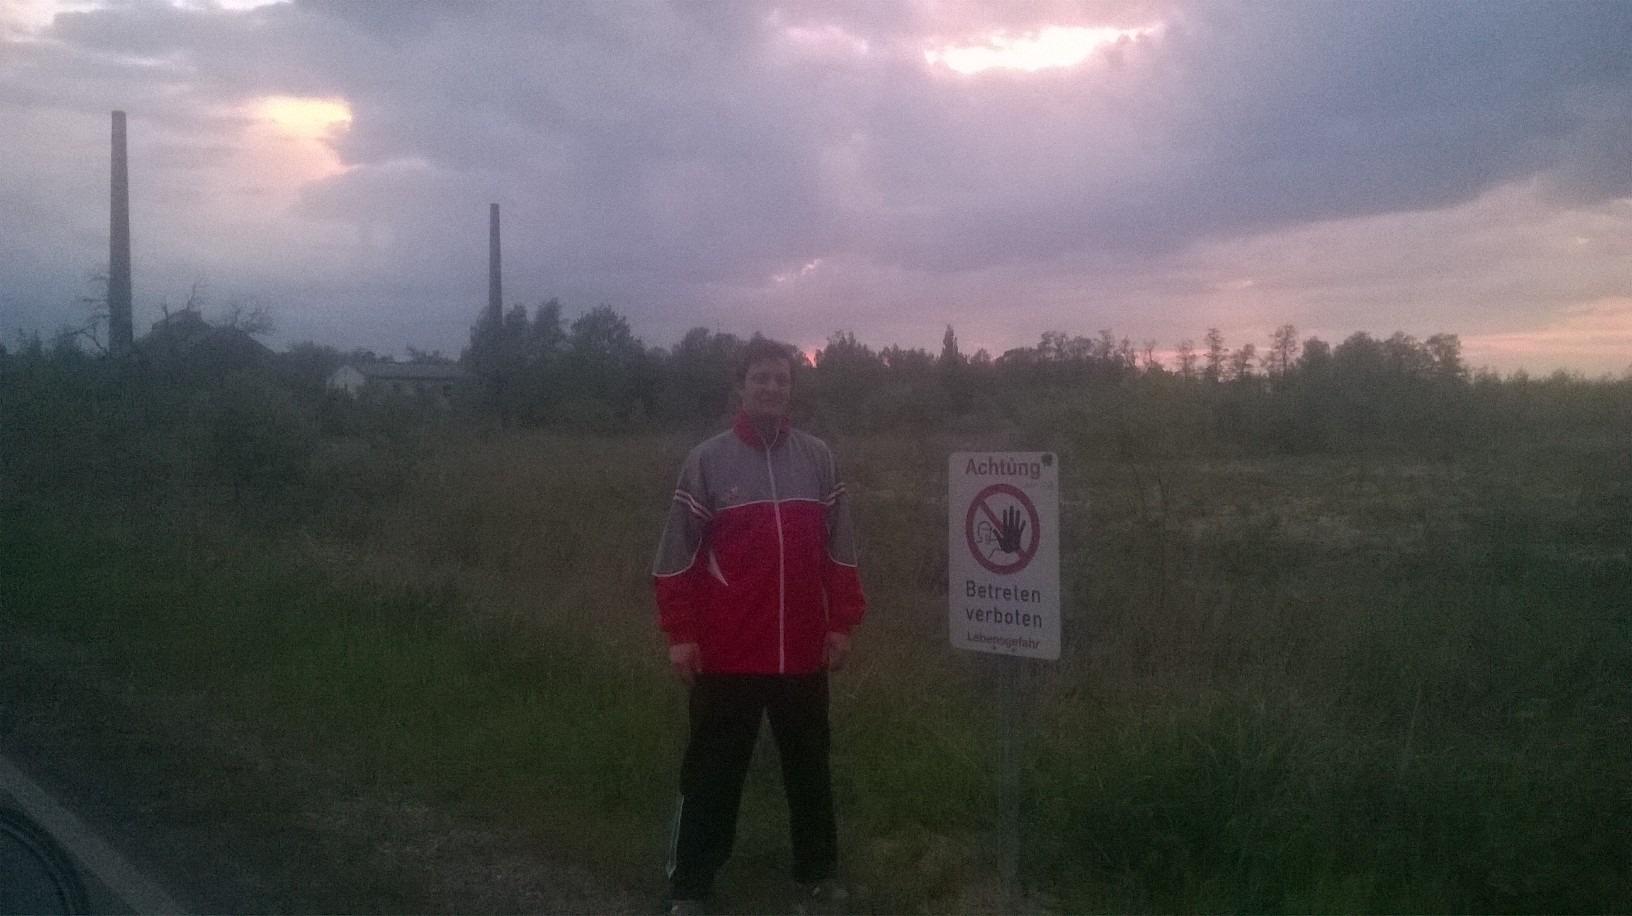 Nikola Perušić na terenu. Novinar, ekolog i prevodilac.